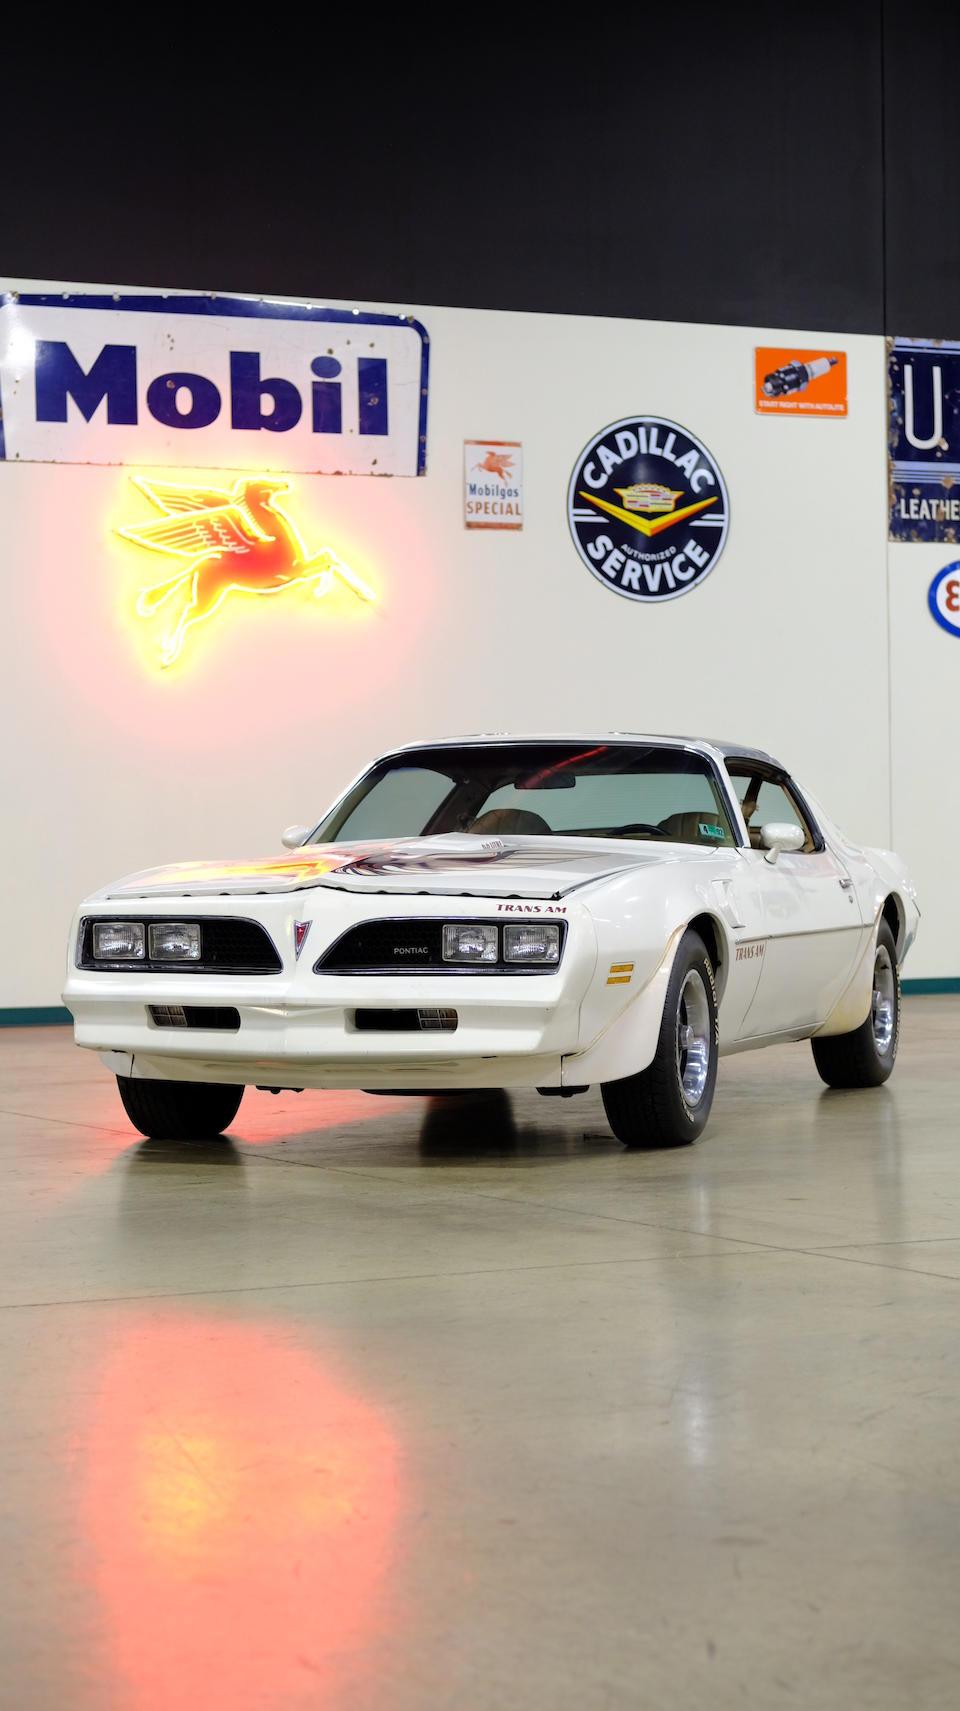 <b>1977 Pontiac Trans Am</b><br />Chassis no. 2W97Z7N182152